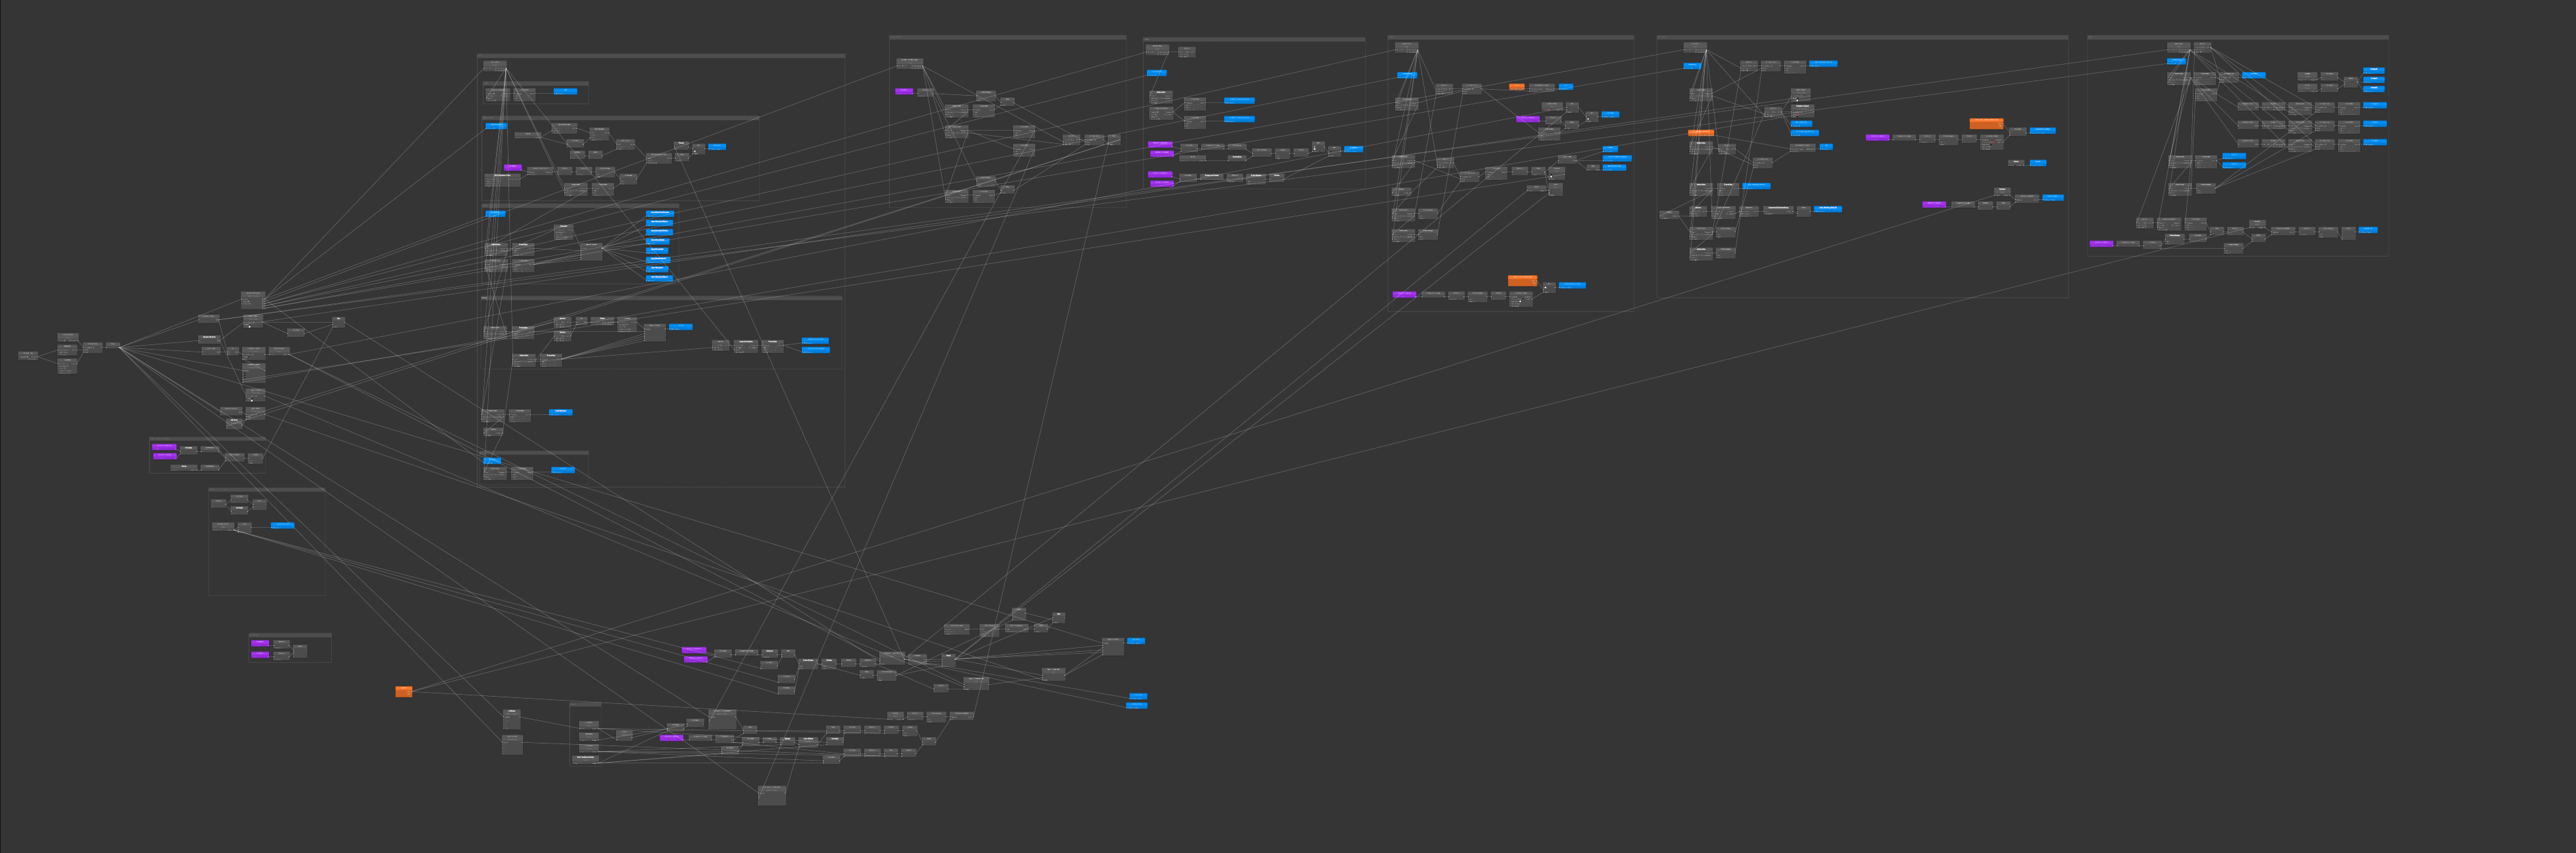 patchGraphExpanded